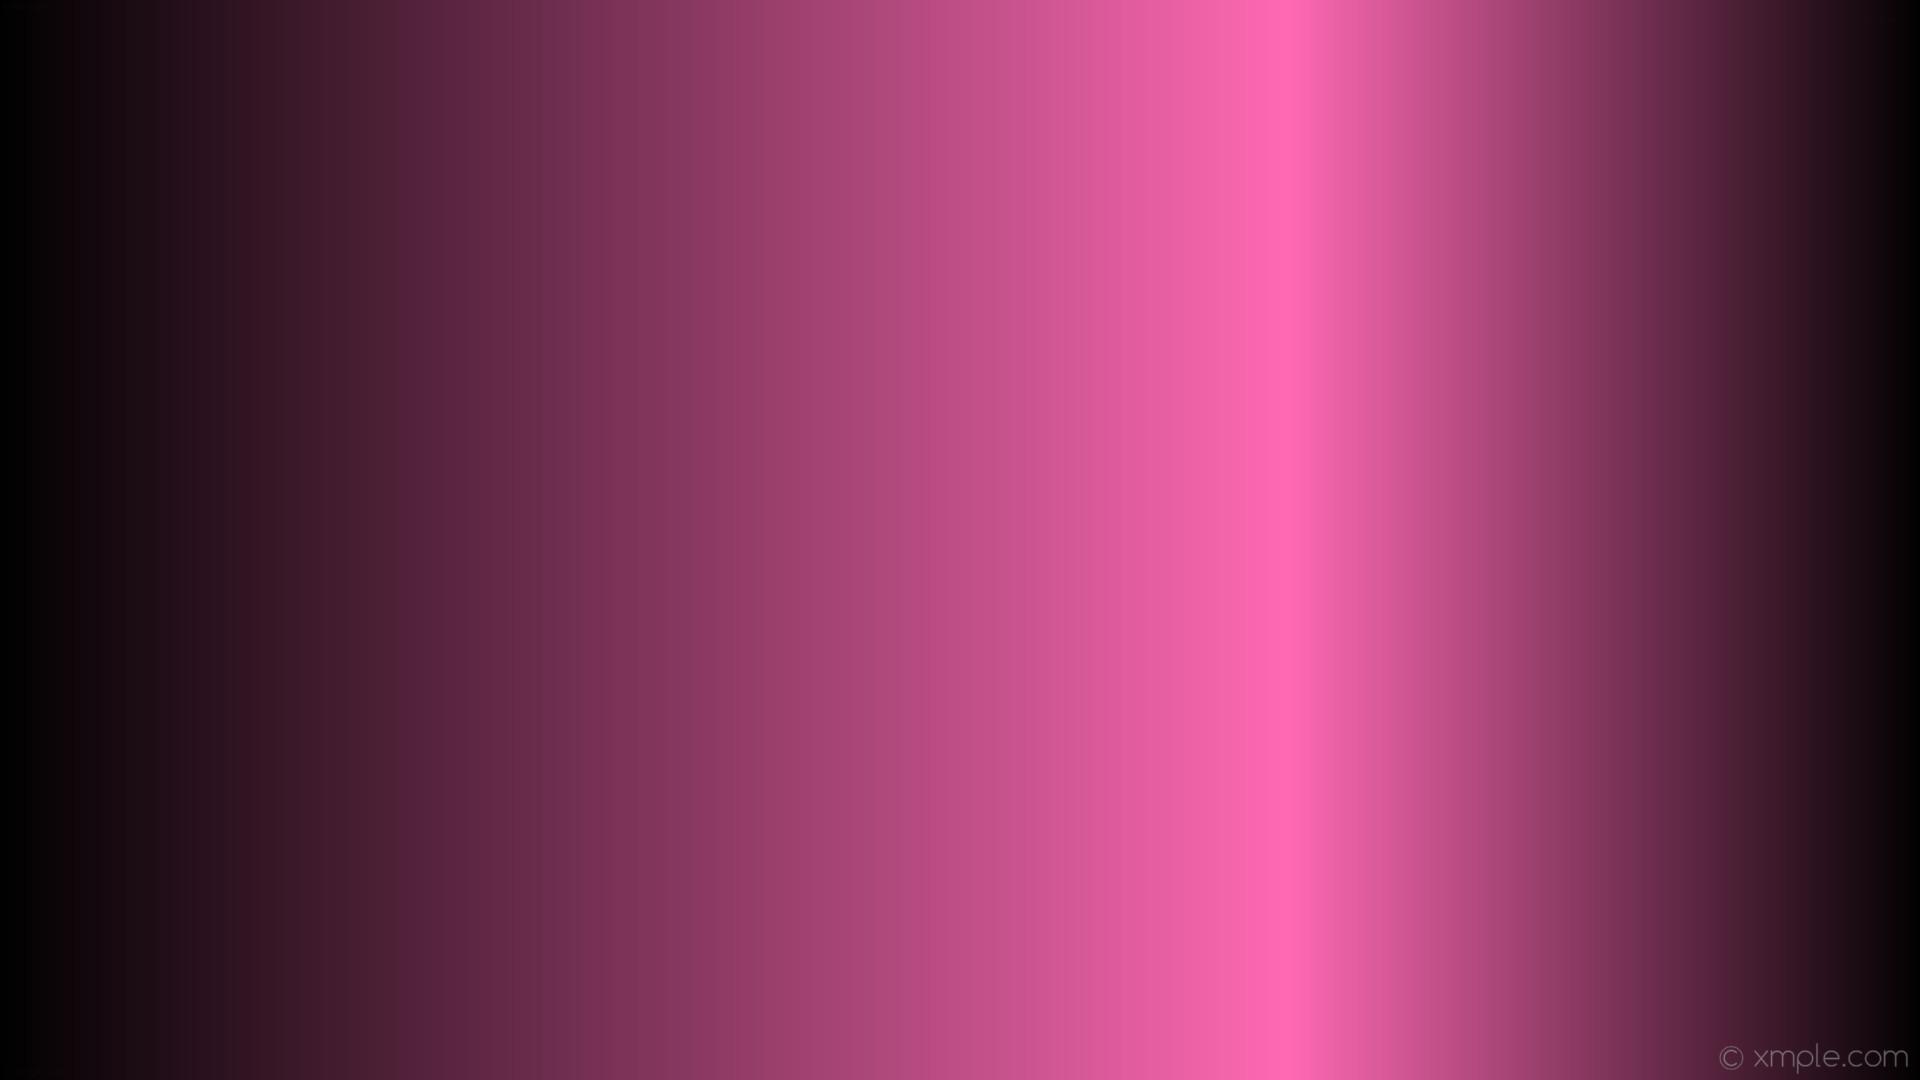 wallpaper highlight black pink gradient linear hot pink #000000 #ff69b4  180° 67%